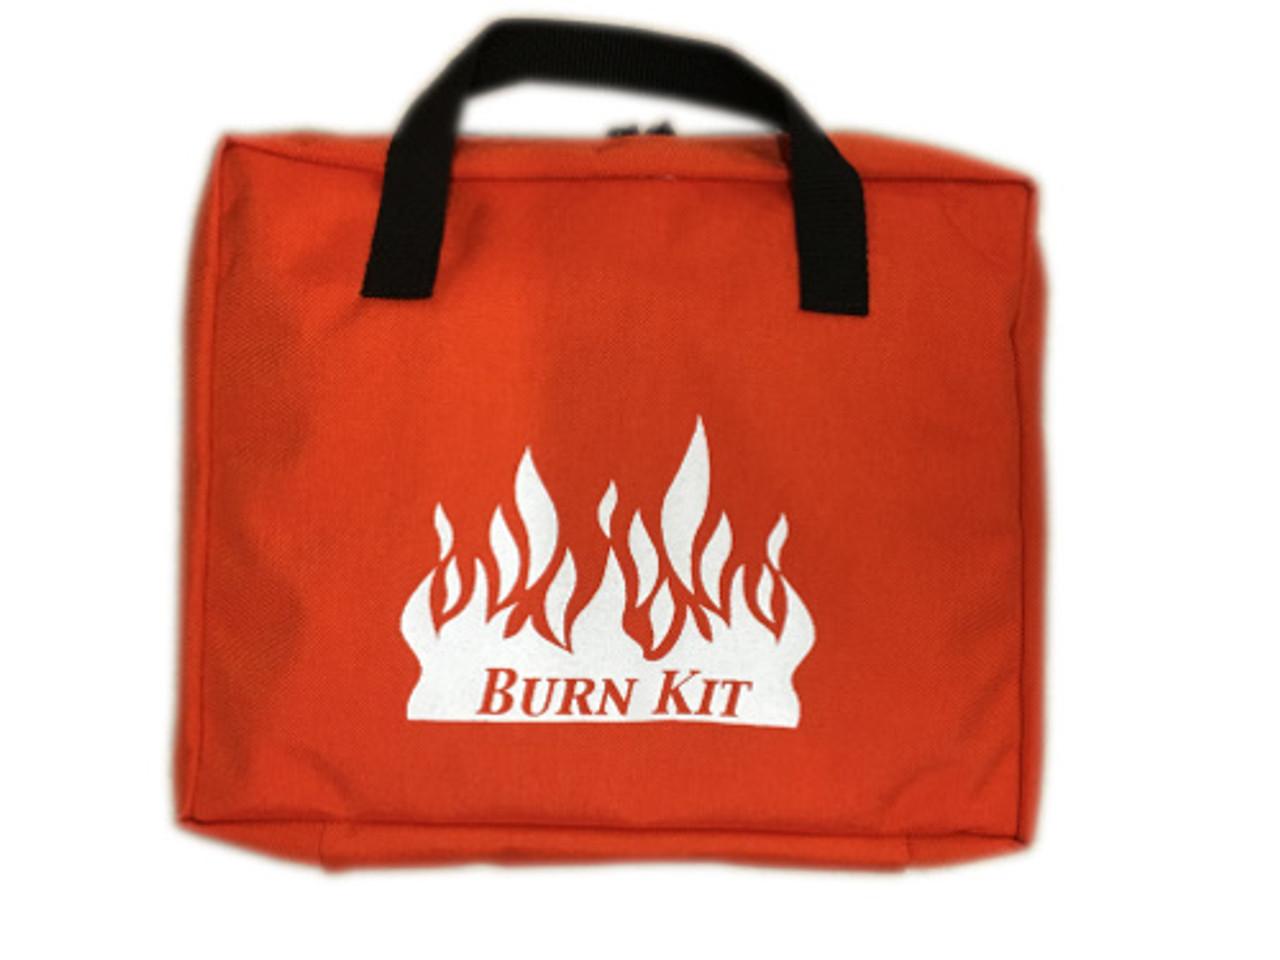 Burn Kit Bag with Zipper Closure - Orange